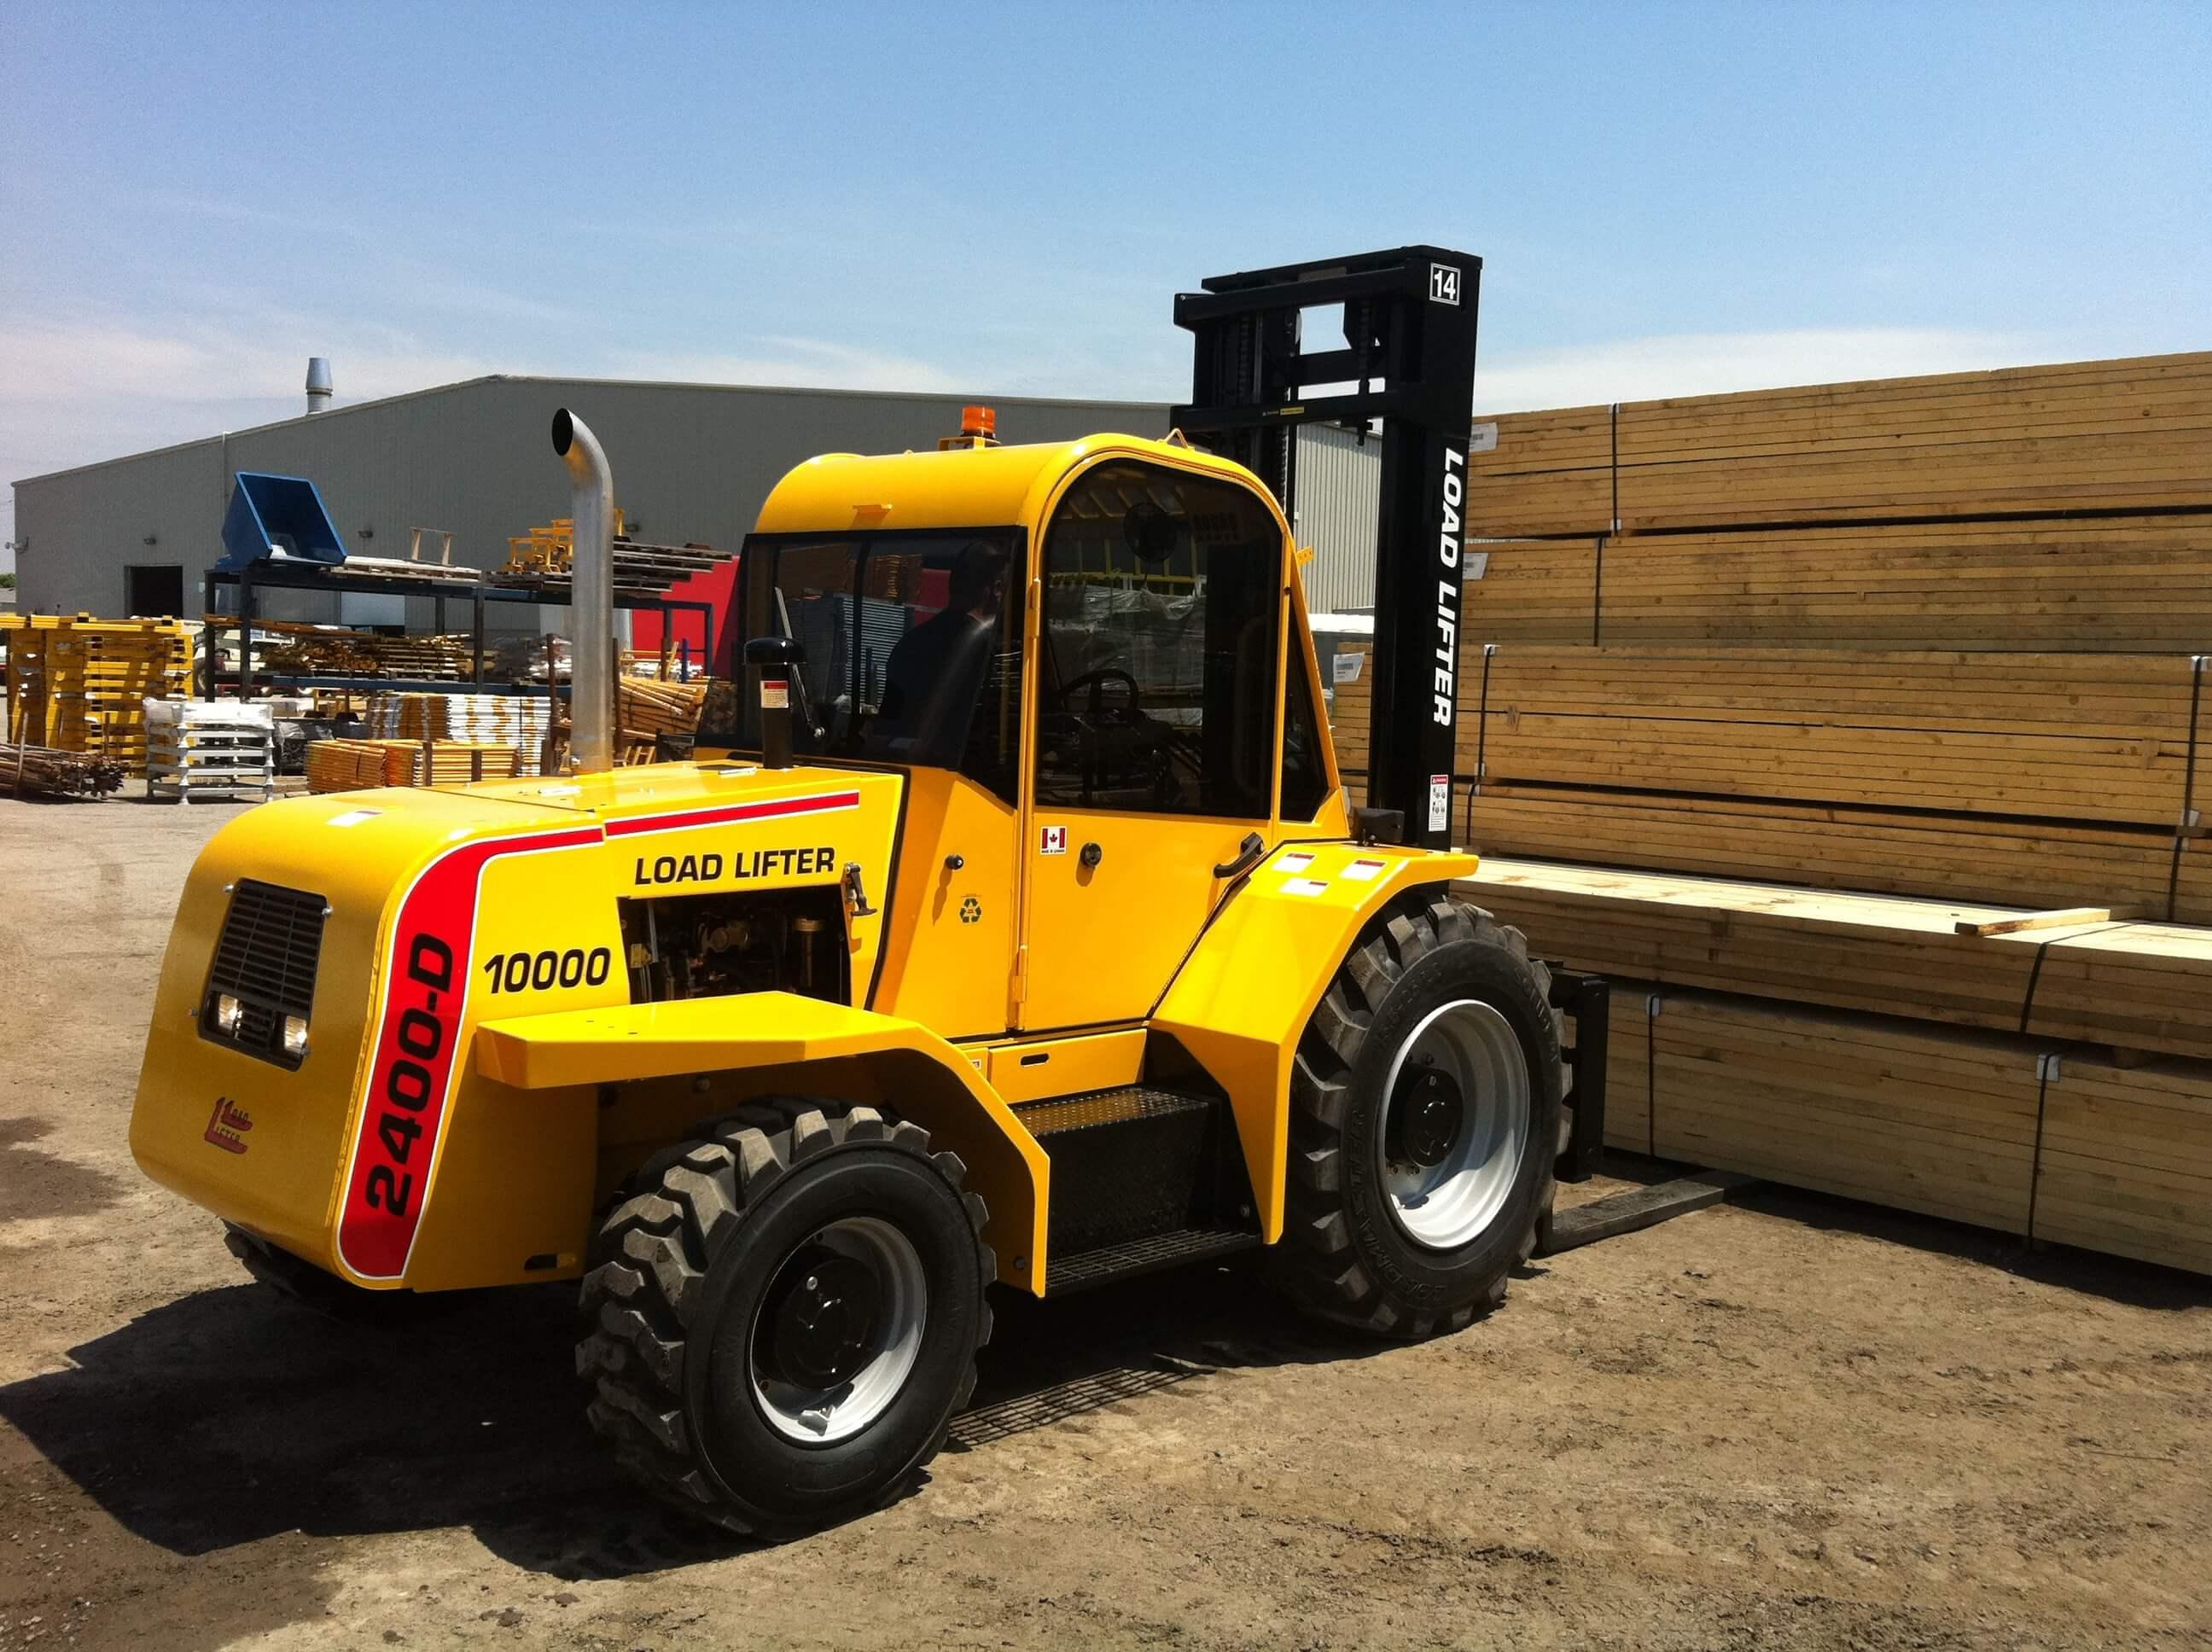 Load Lifter 2400 series All Terrain Forklift